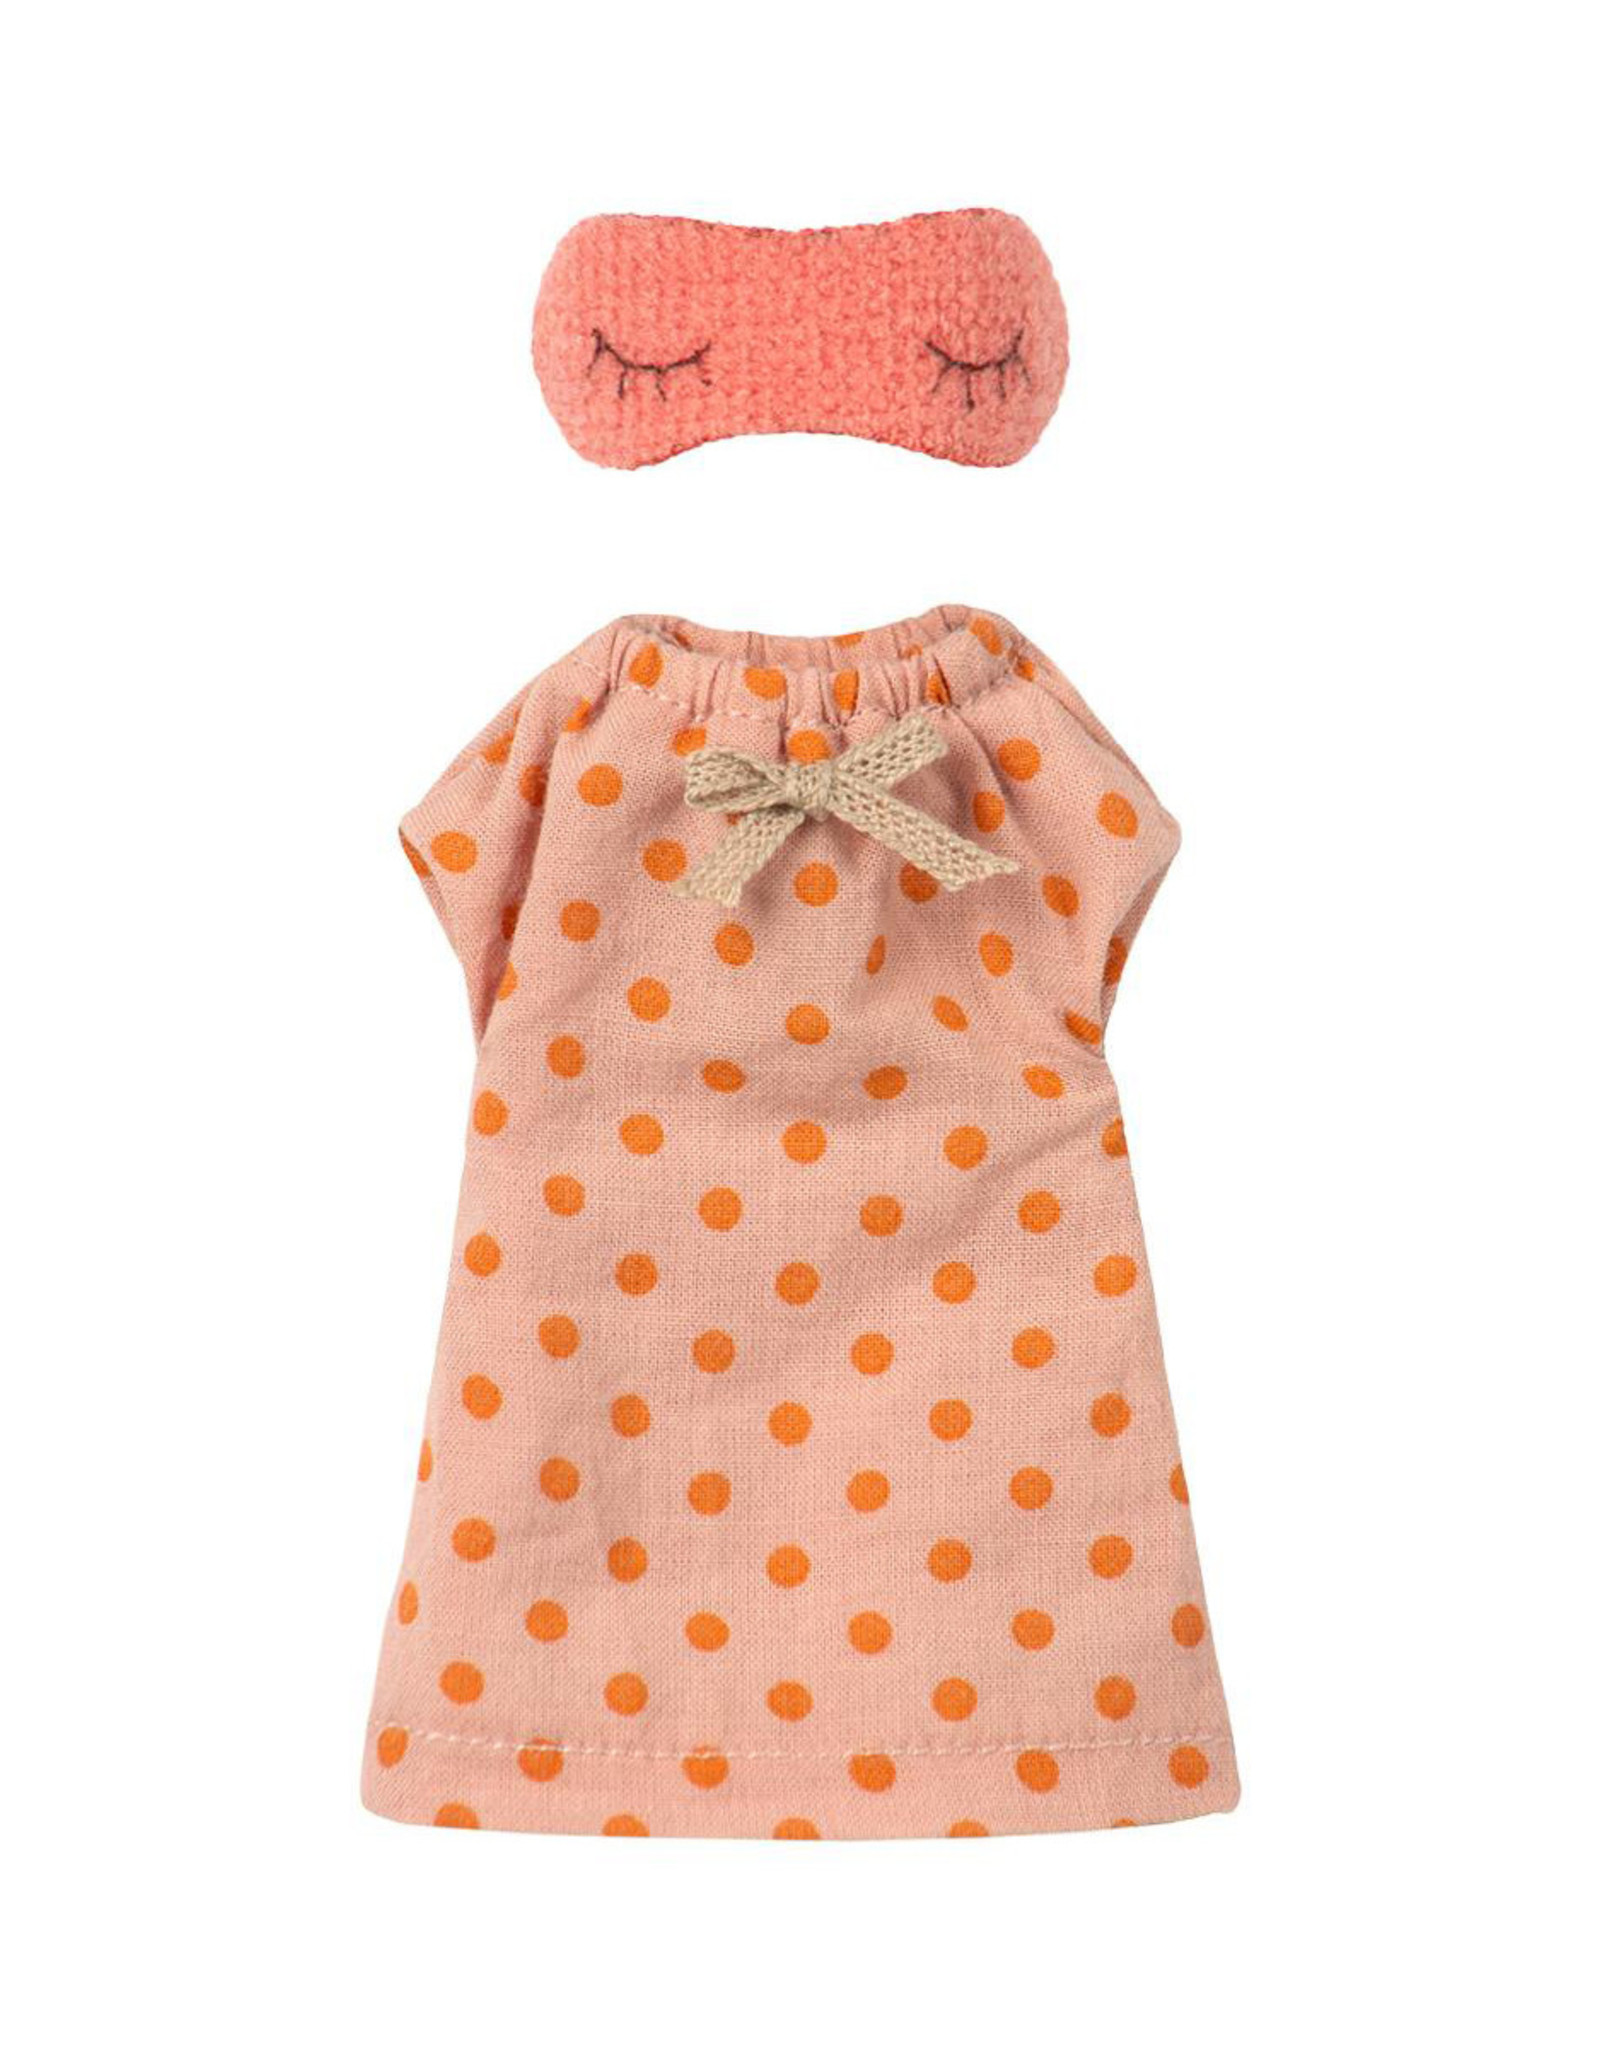 Maileg Sleepy Mum Mouse Outfit